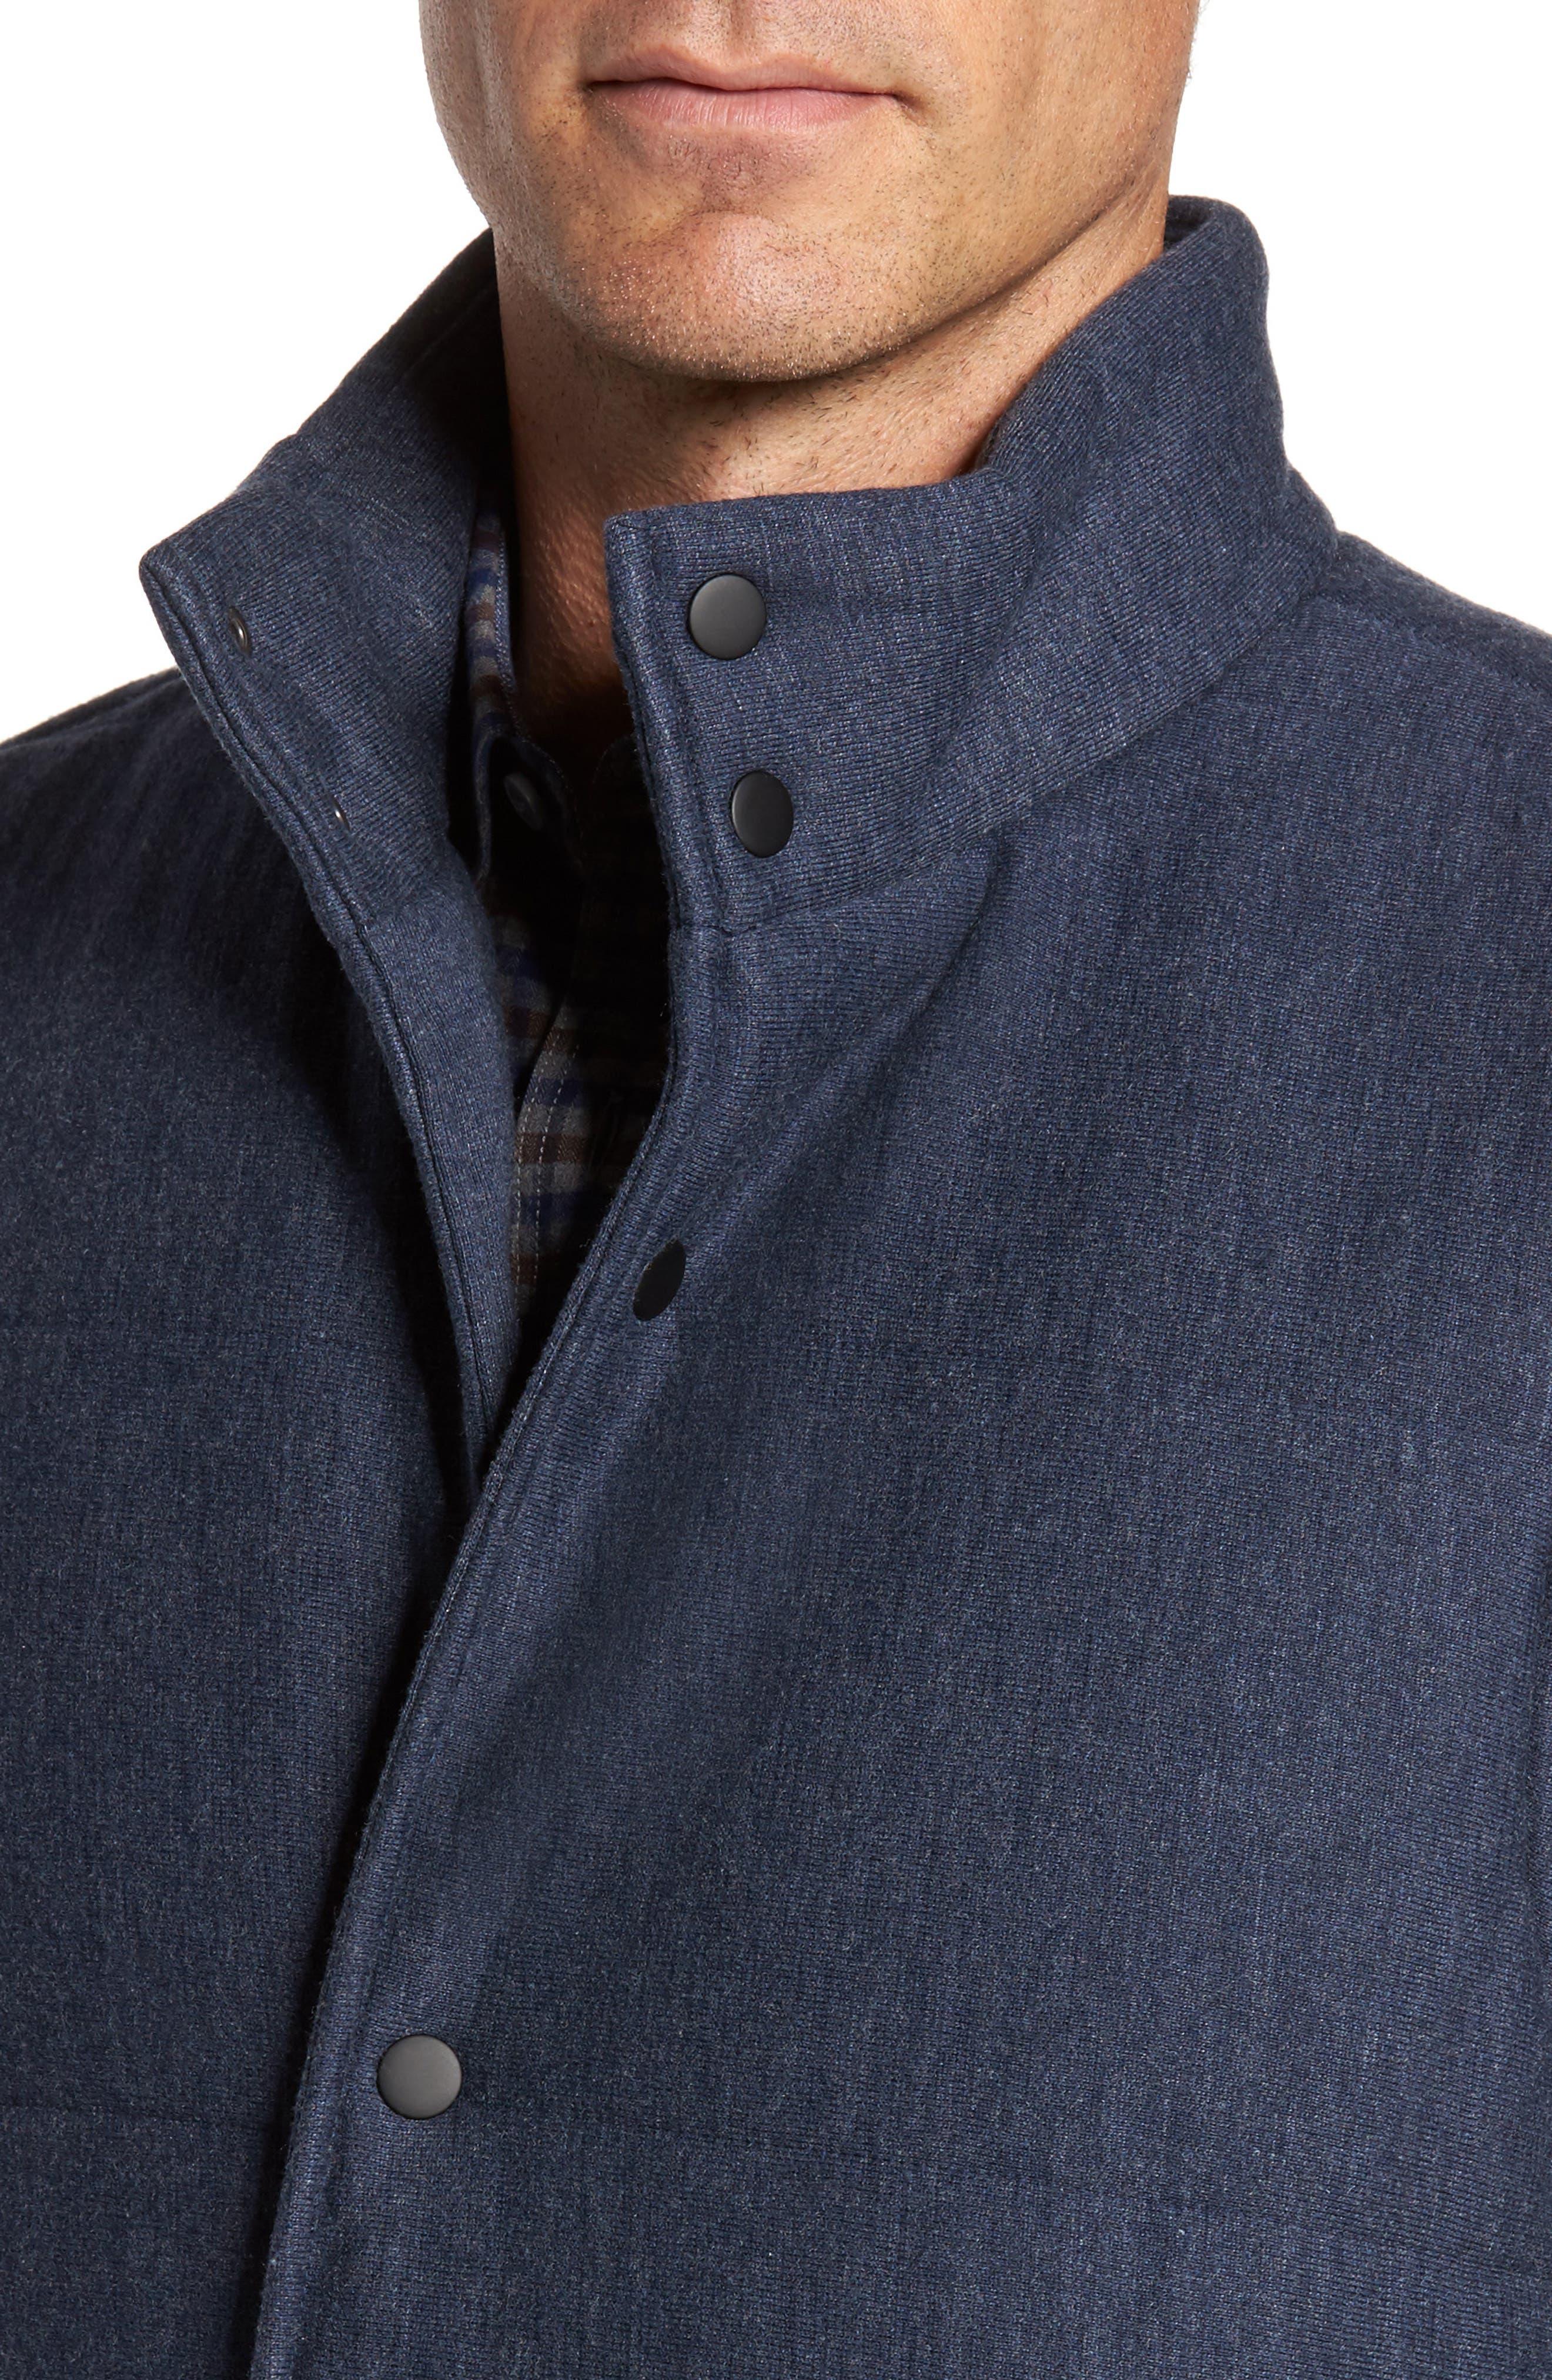 Quilted Fleece Vest,                             Alternate thumbnail 4, color,                             Navy Iris Heather